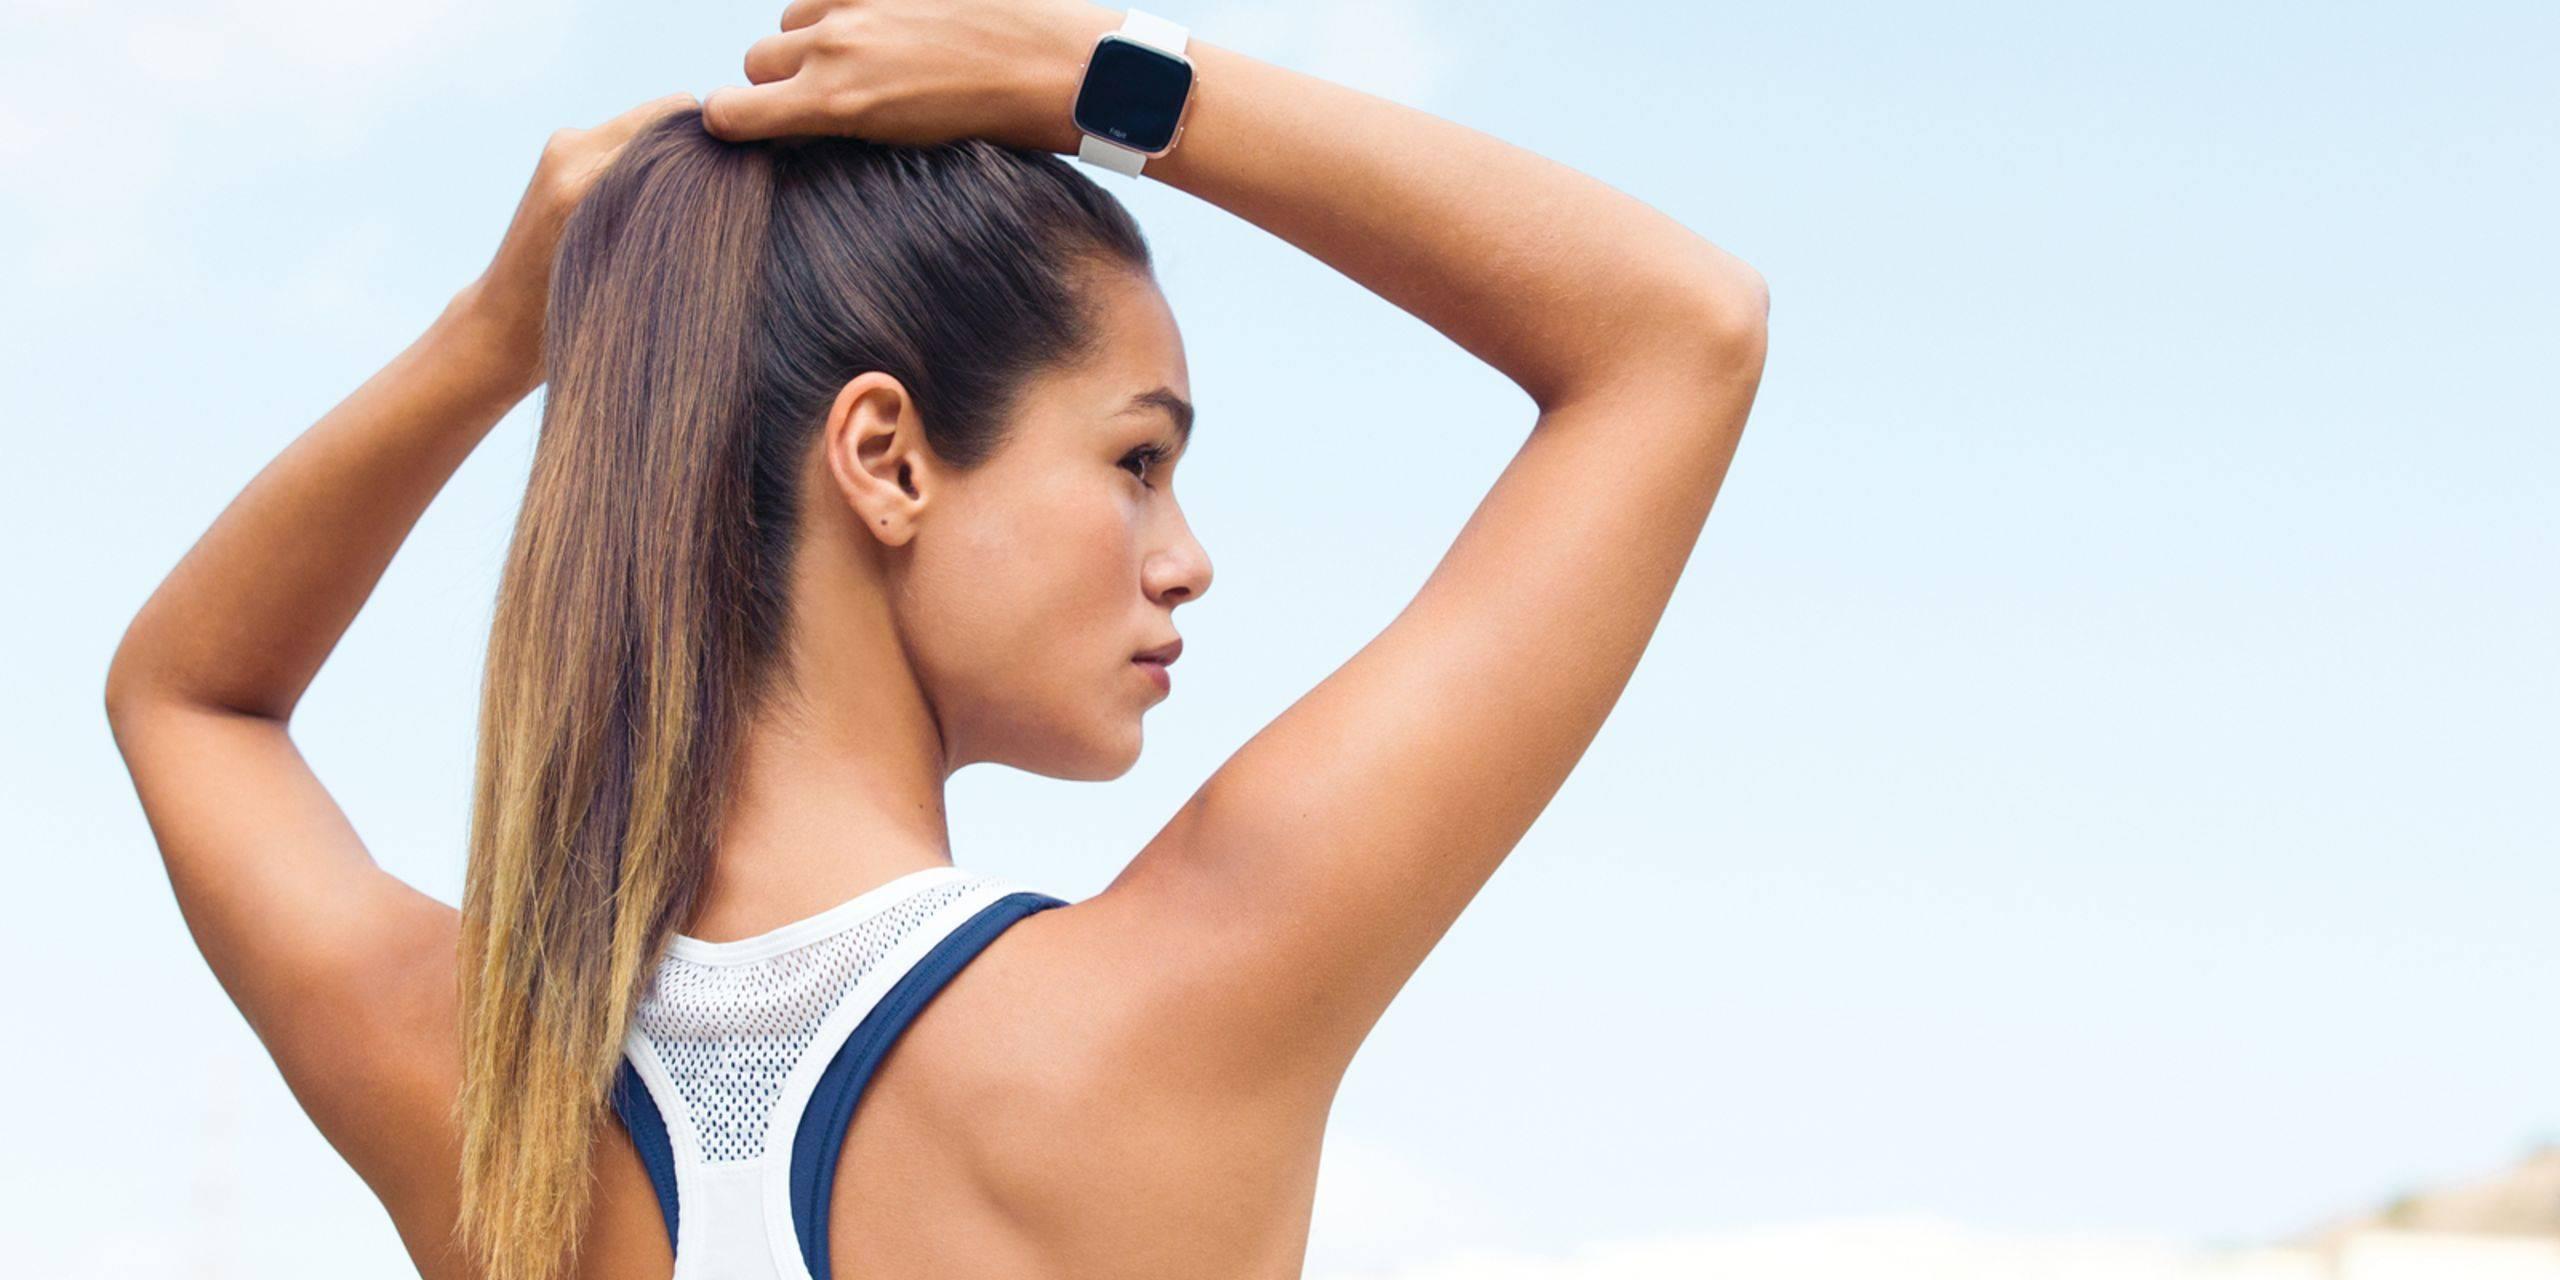 Fitness-Tracker